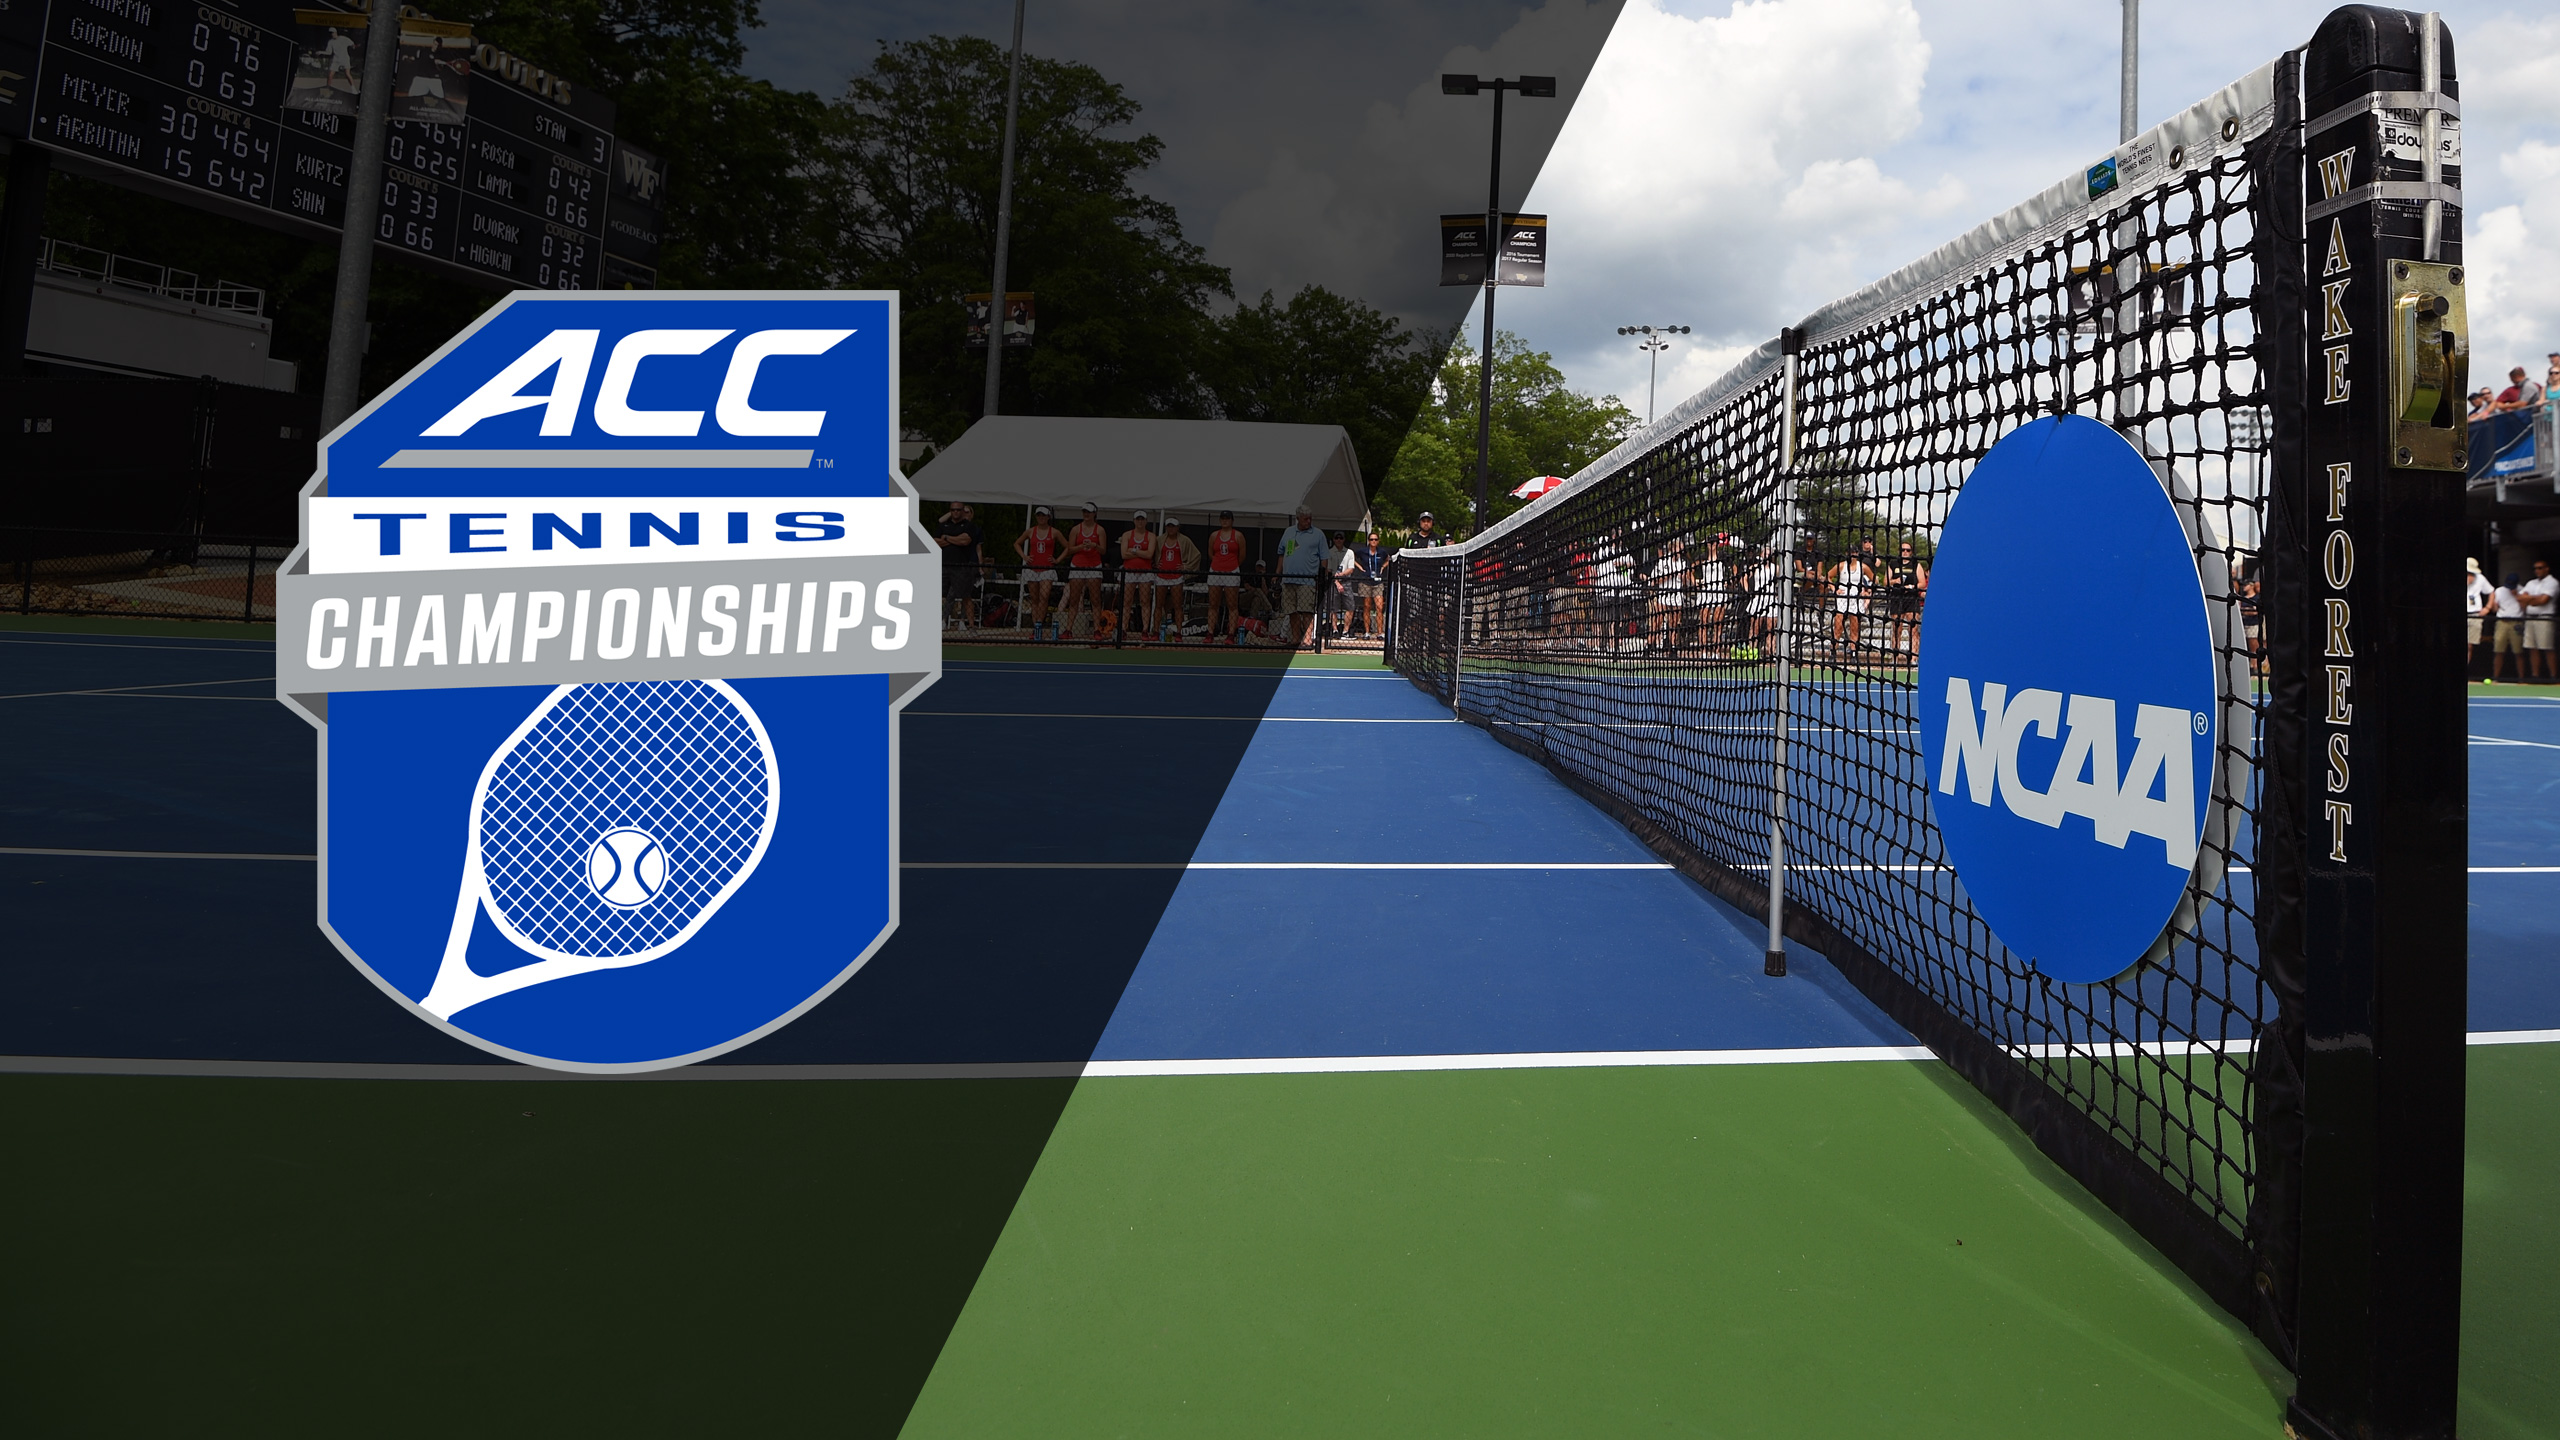 ACC Men's Tennis Championship (Men's Semifinals)